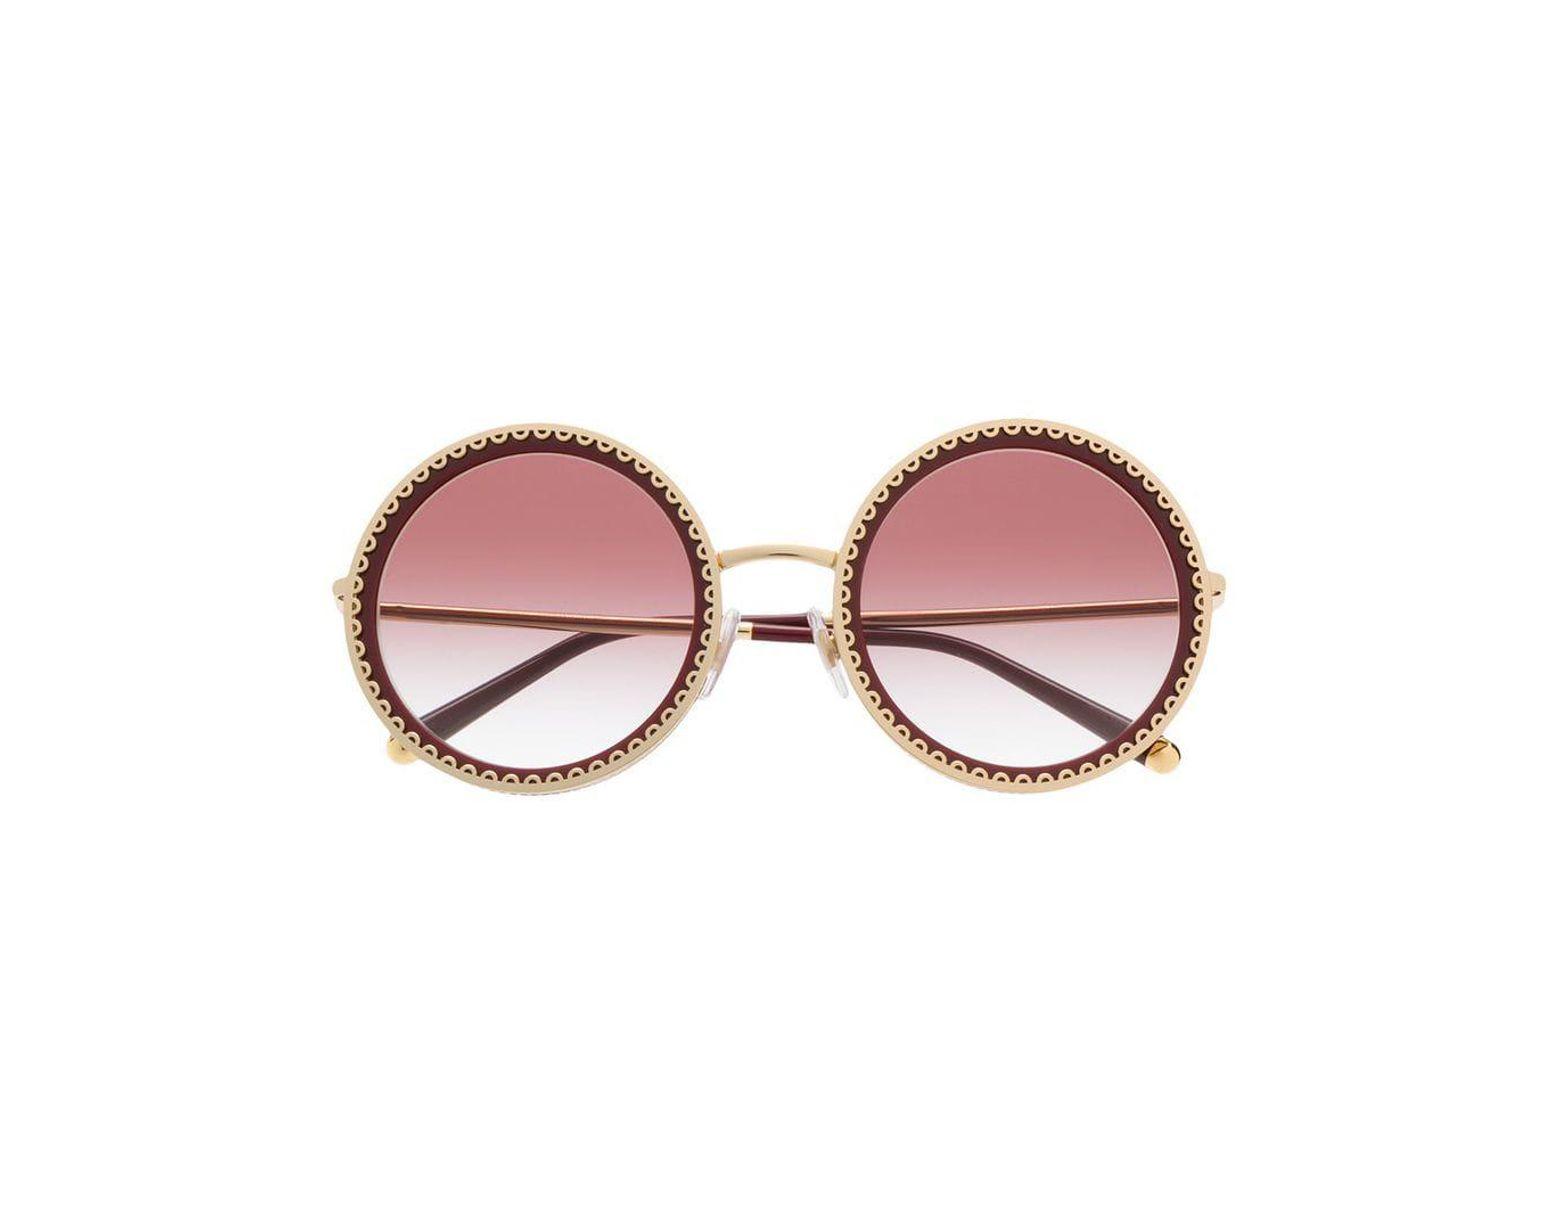 7b8306feffd8 Dolce & Gabbana Cuore Sacro Sunglasses in Red - Lyst